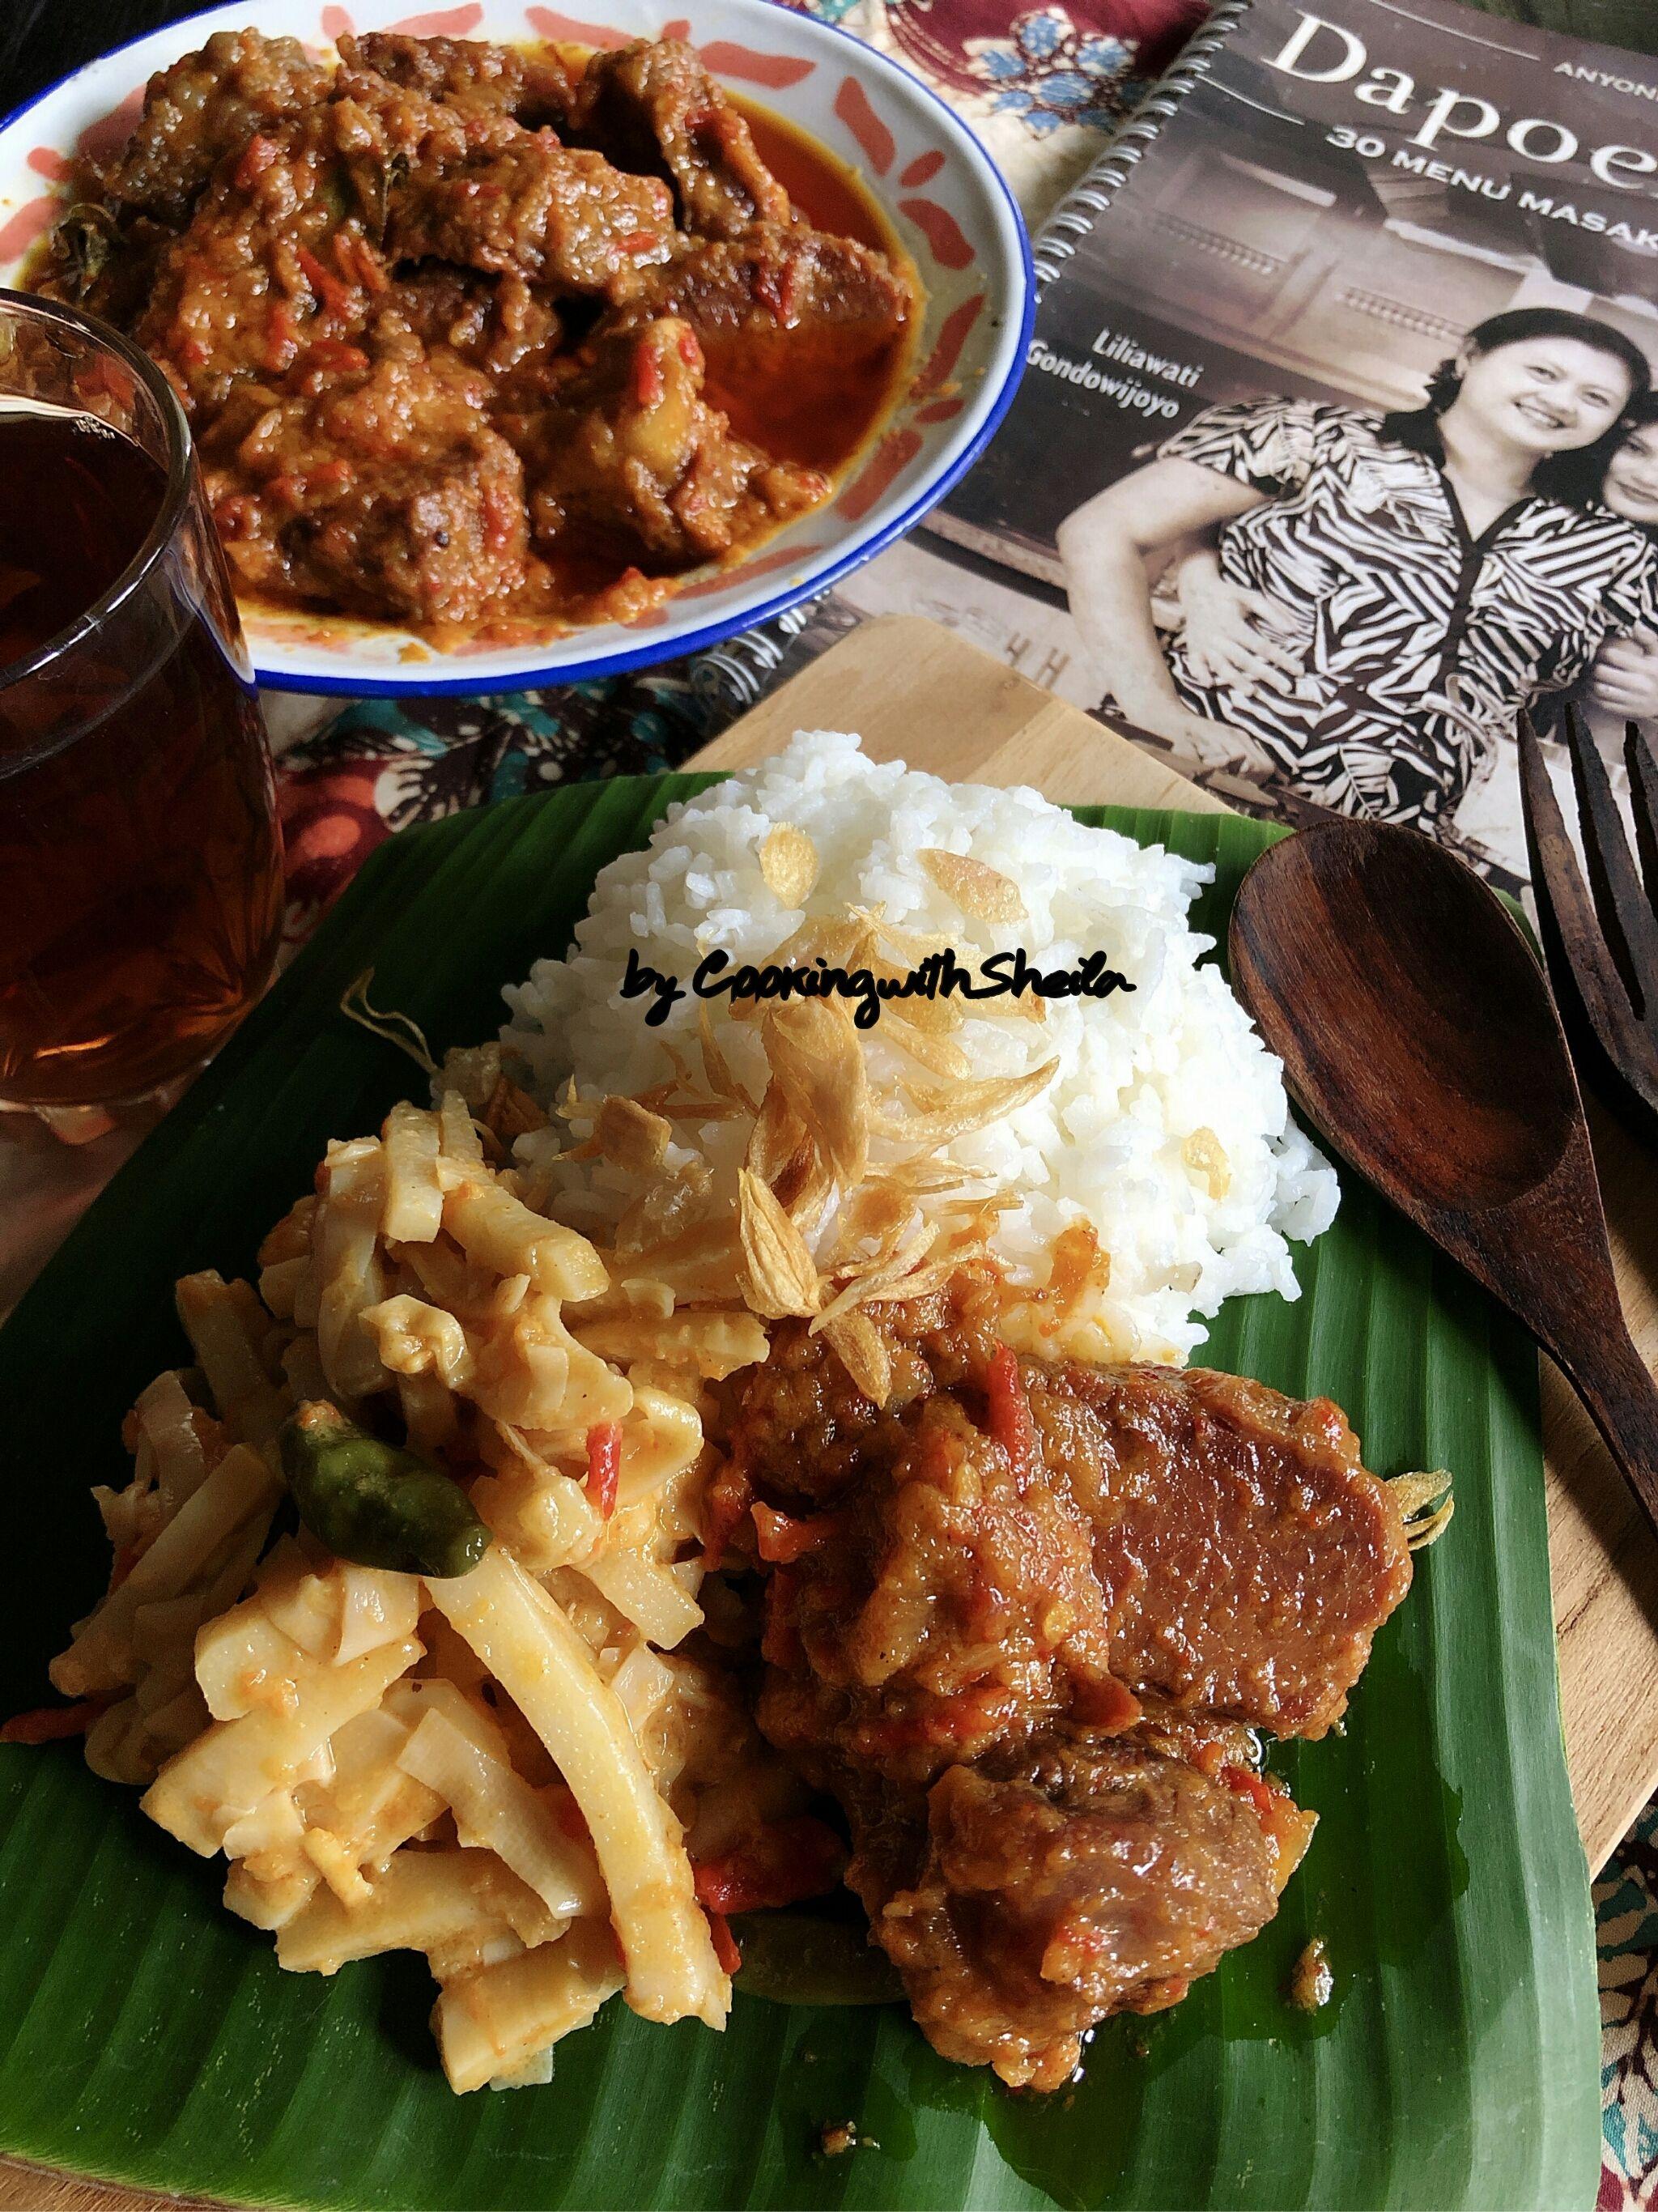 Sebelumnya Beberapa Minggu Yang Lalu Saya Share Menu Ayam Bumbu Rujak Berikut Versi Daging Sapi Saya Menggu Resep Daging Resep Masakan Asia Fotografi Makanan